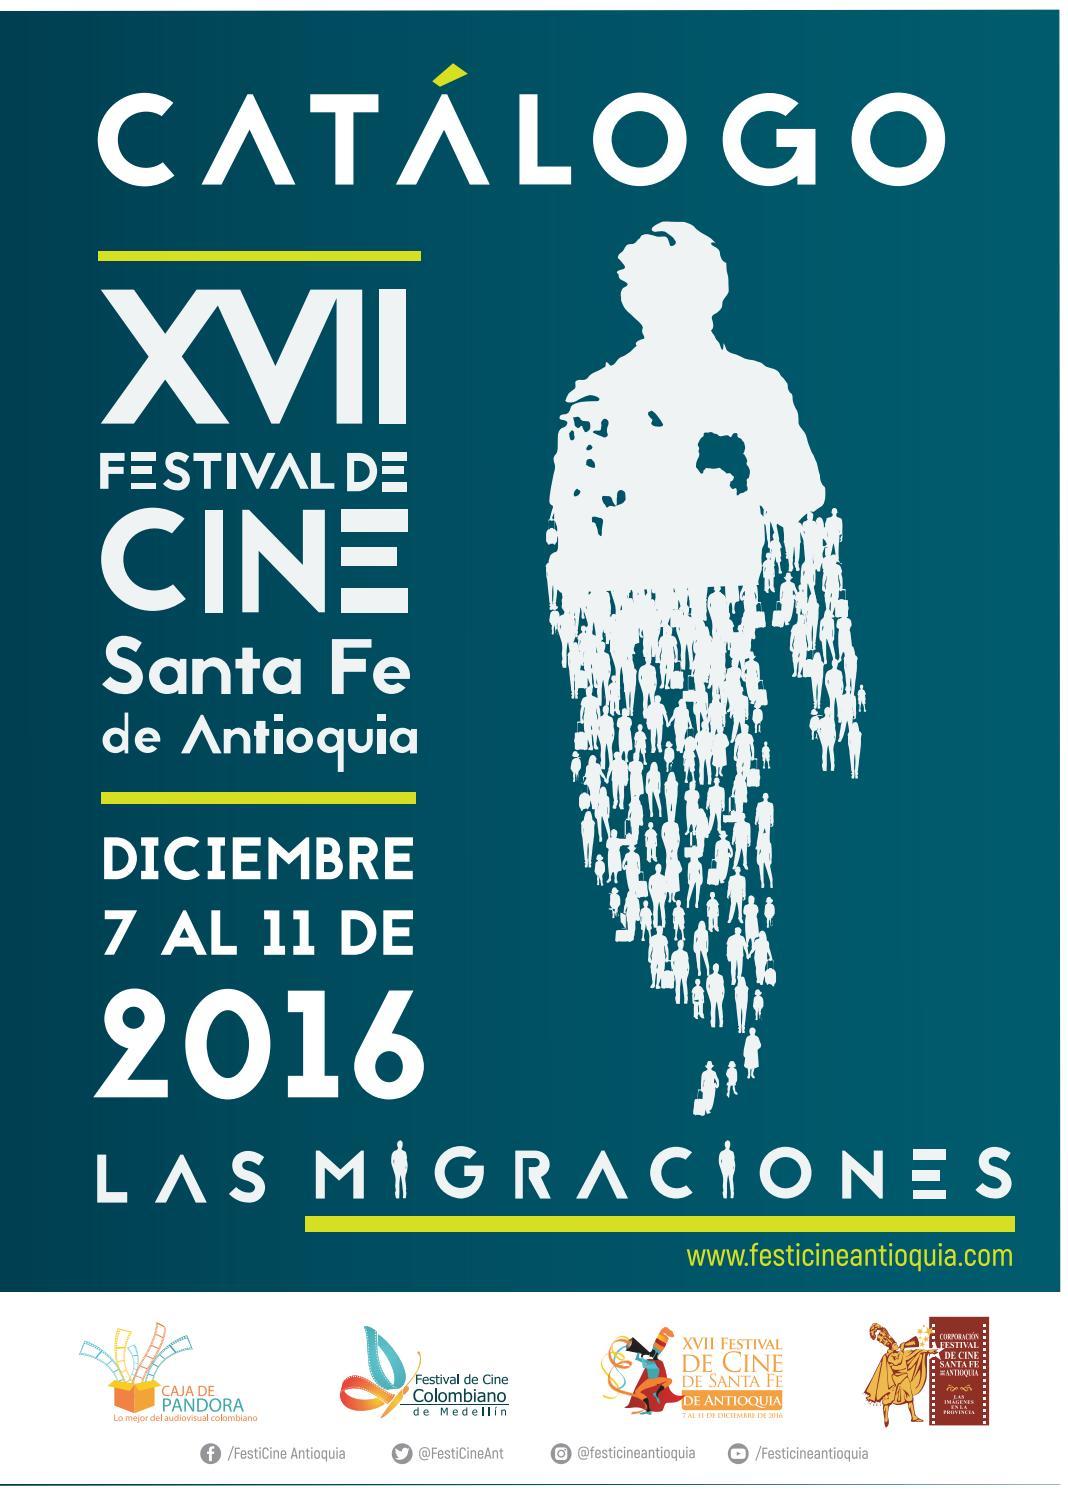 Cat Logo Xvii Festival De Cine De Santa Fe De Antioquia Las  # Hassan Muebles Gavilan